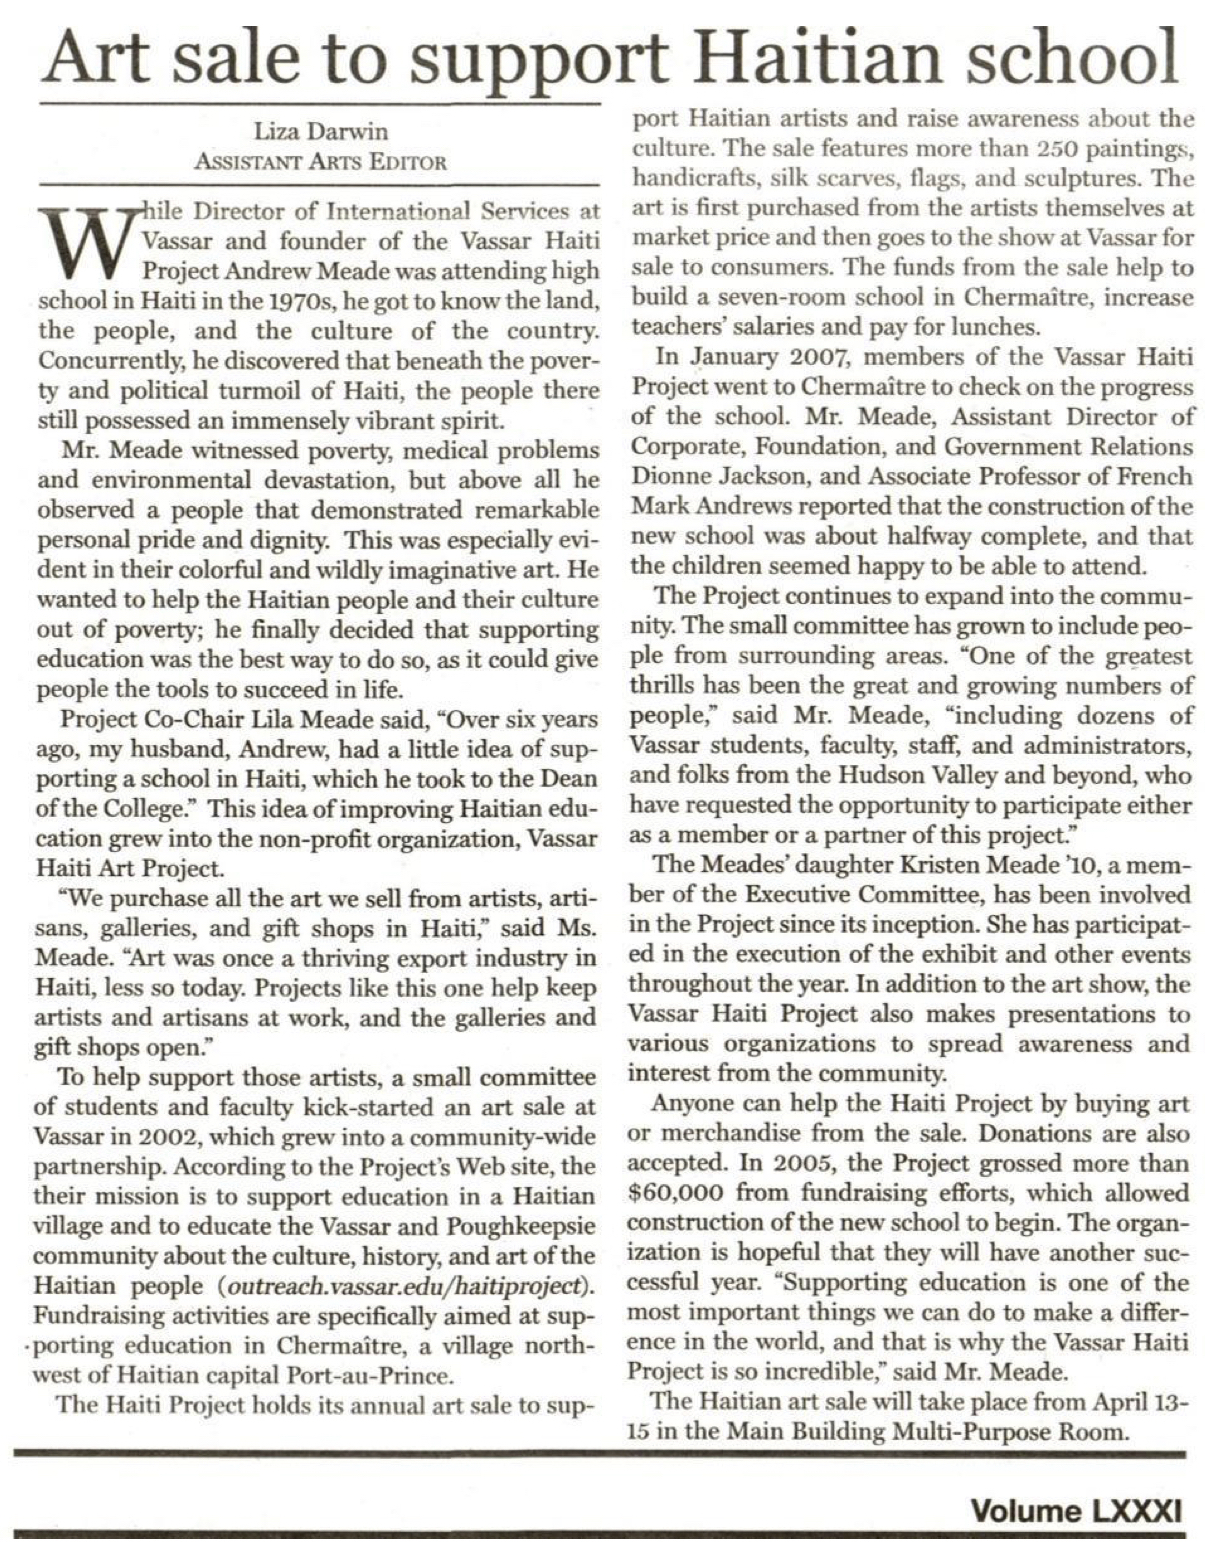 VHP Page 15.jpg